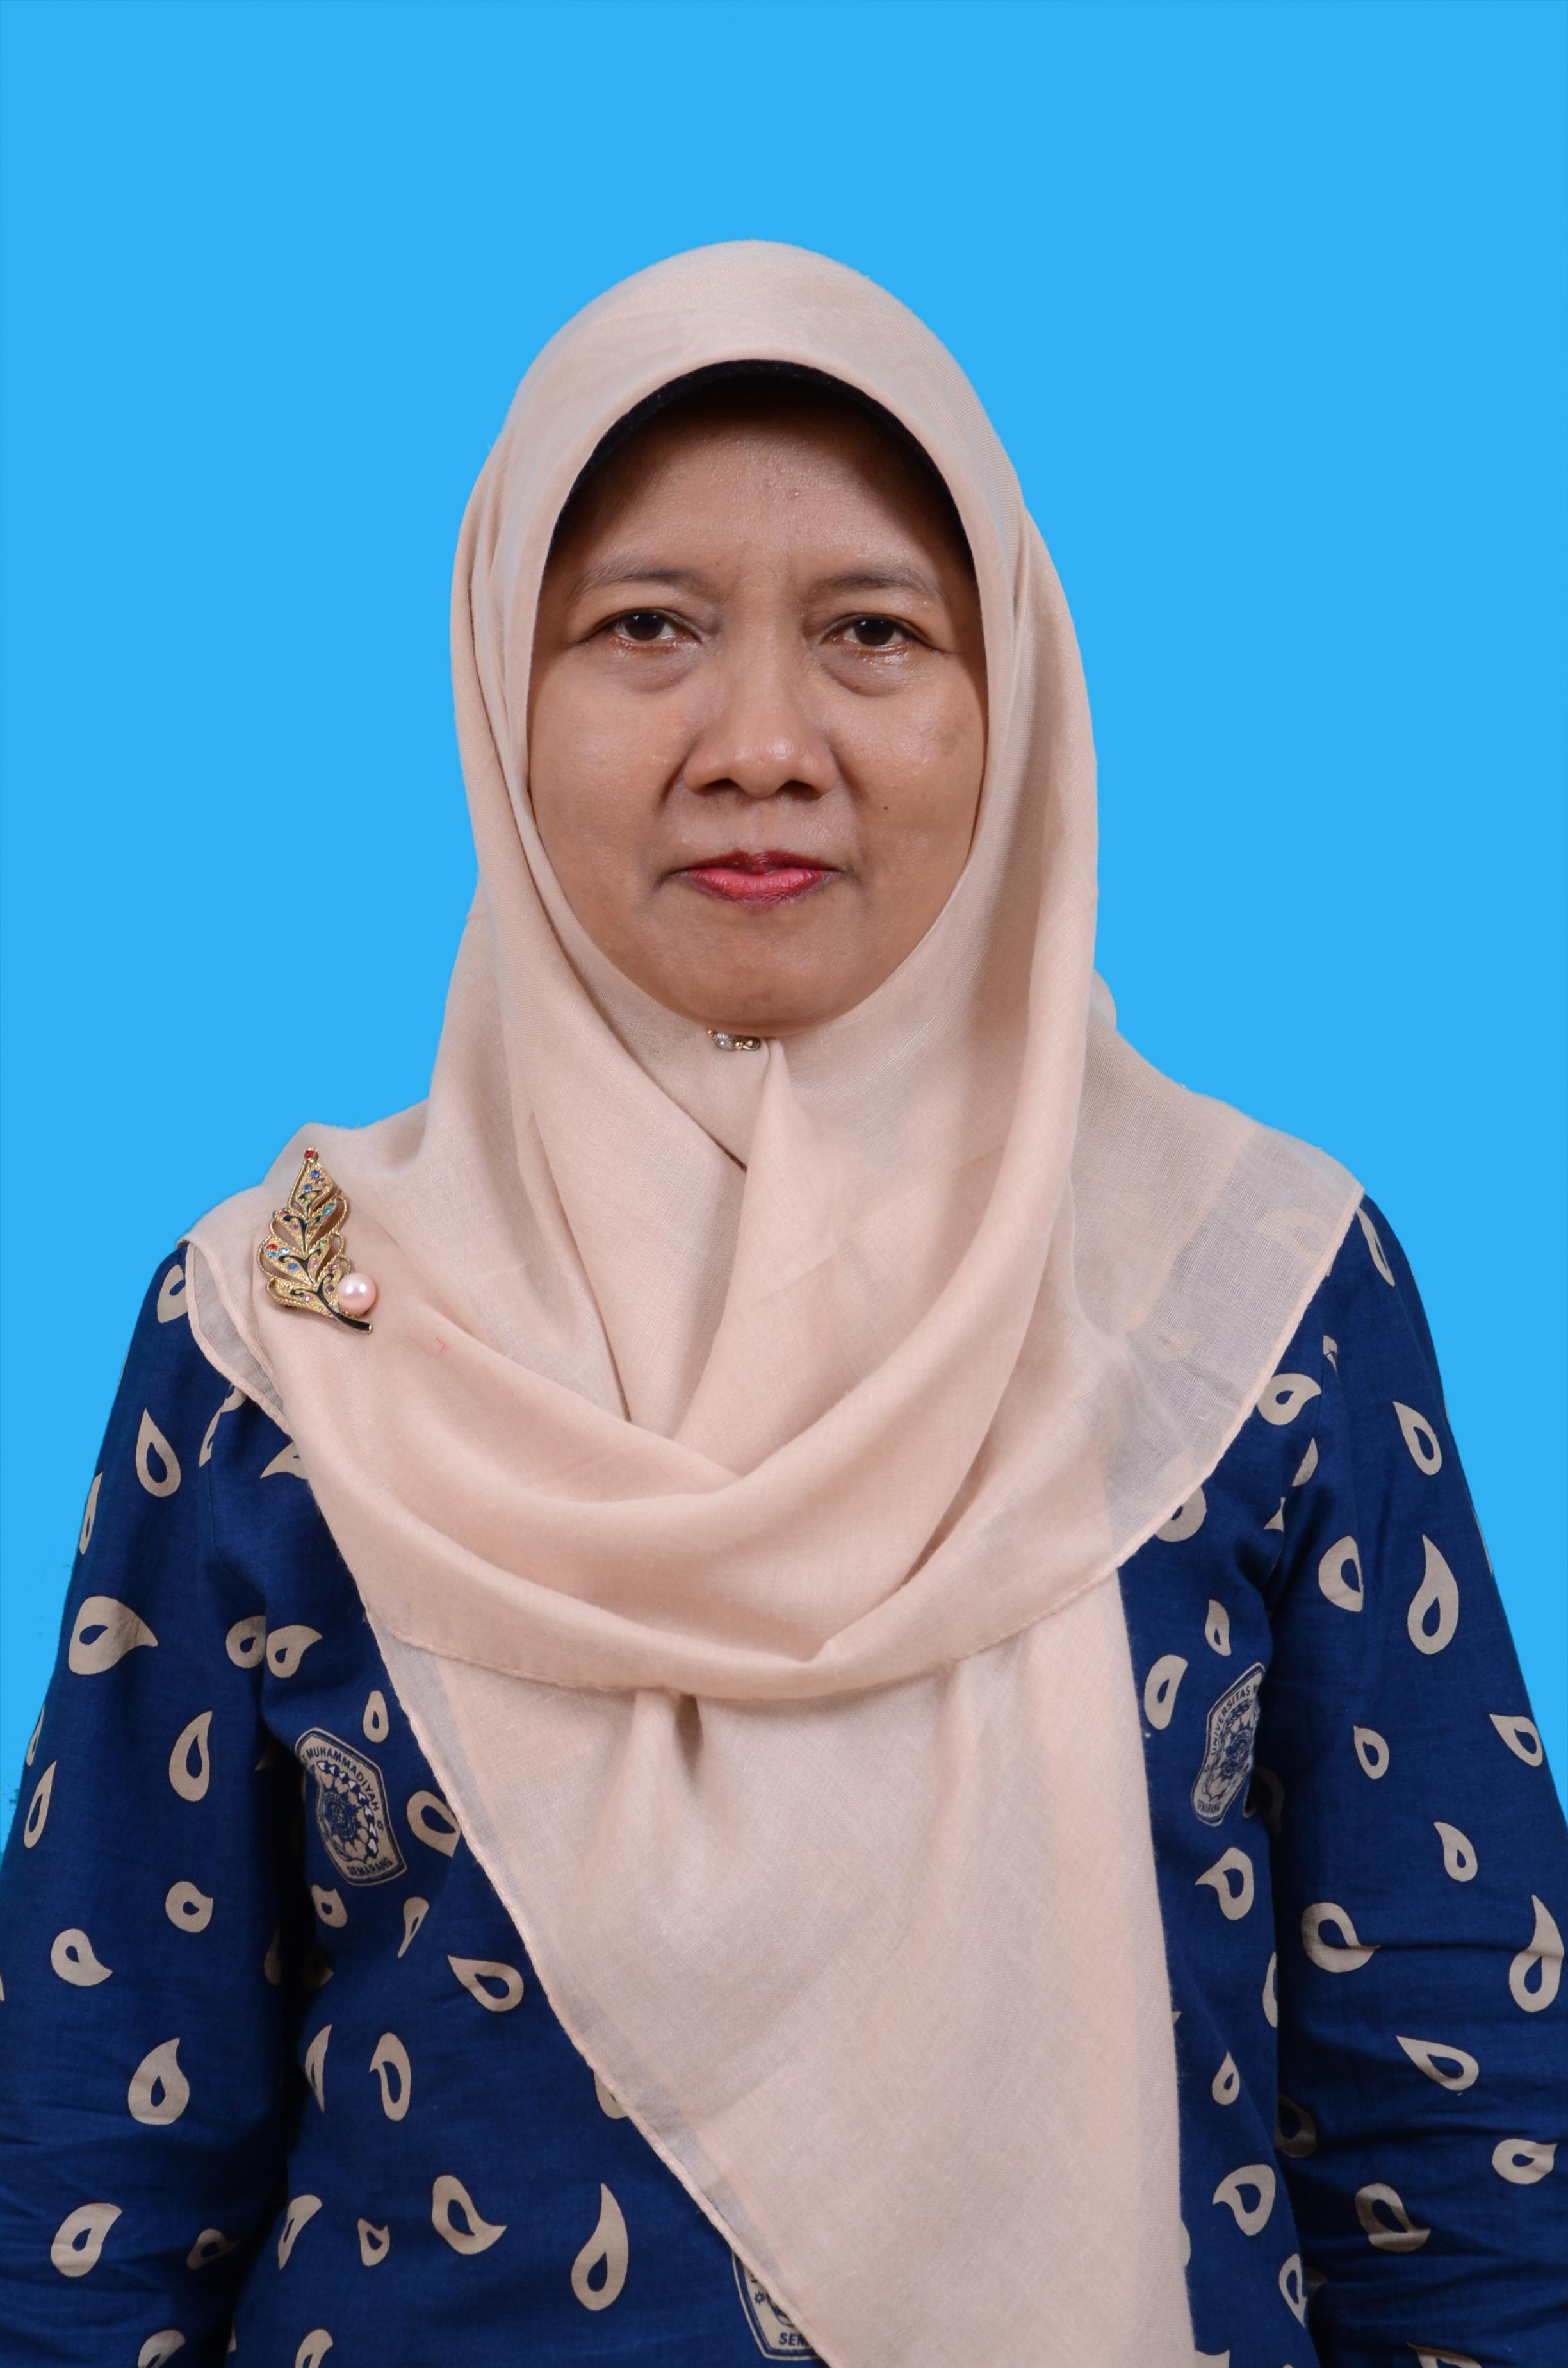 Dosen FKM Unimus Bertambah Satu Doktor Lagi a.n. Dr. Ir. Rahayu Astuti, M.Kes.